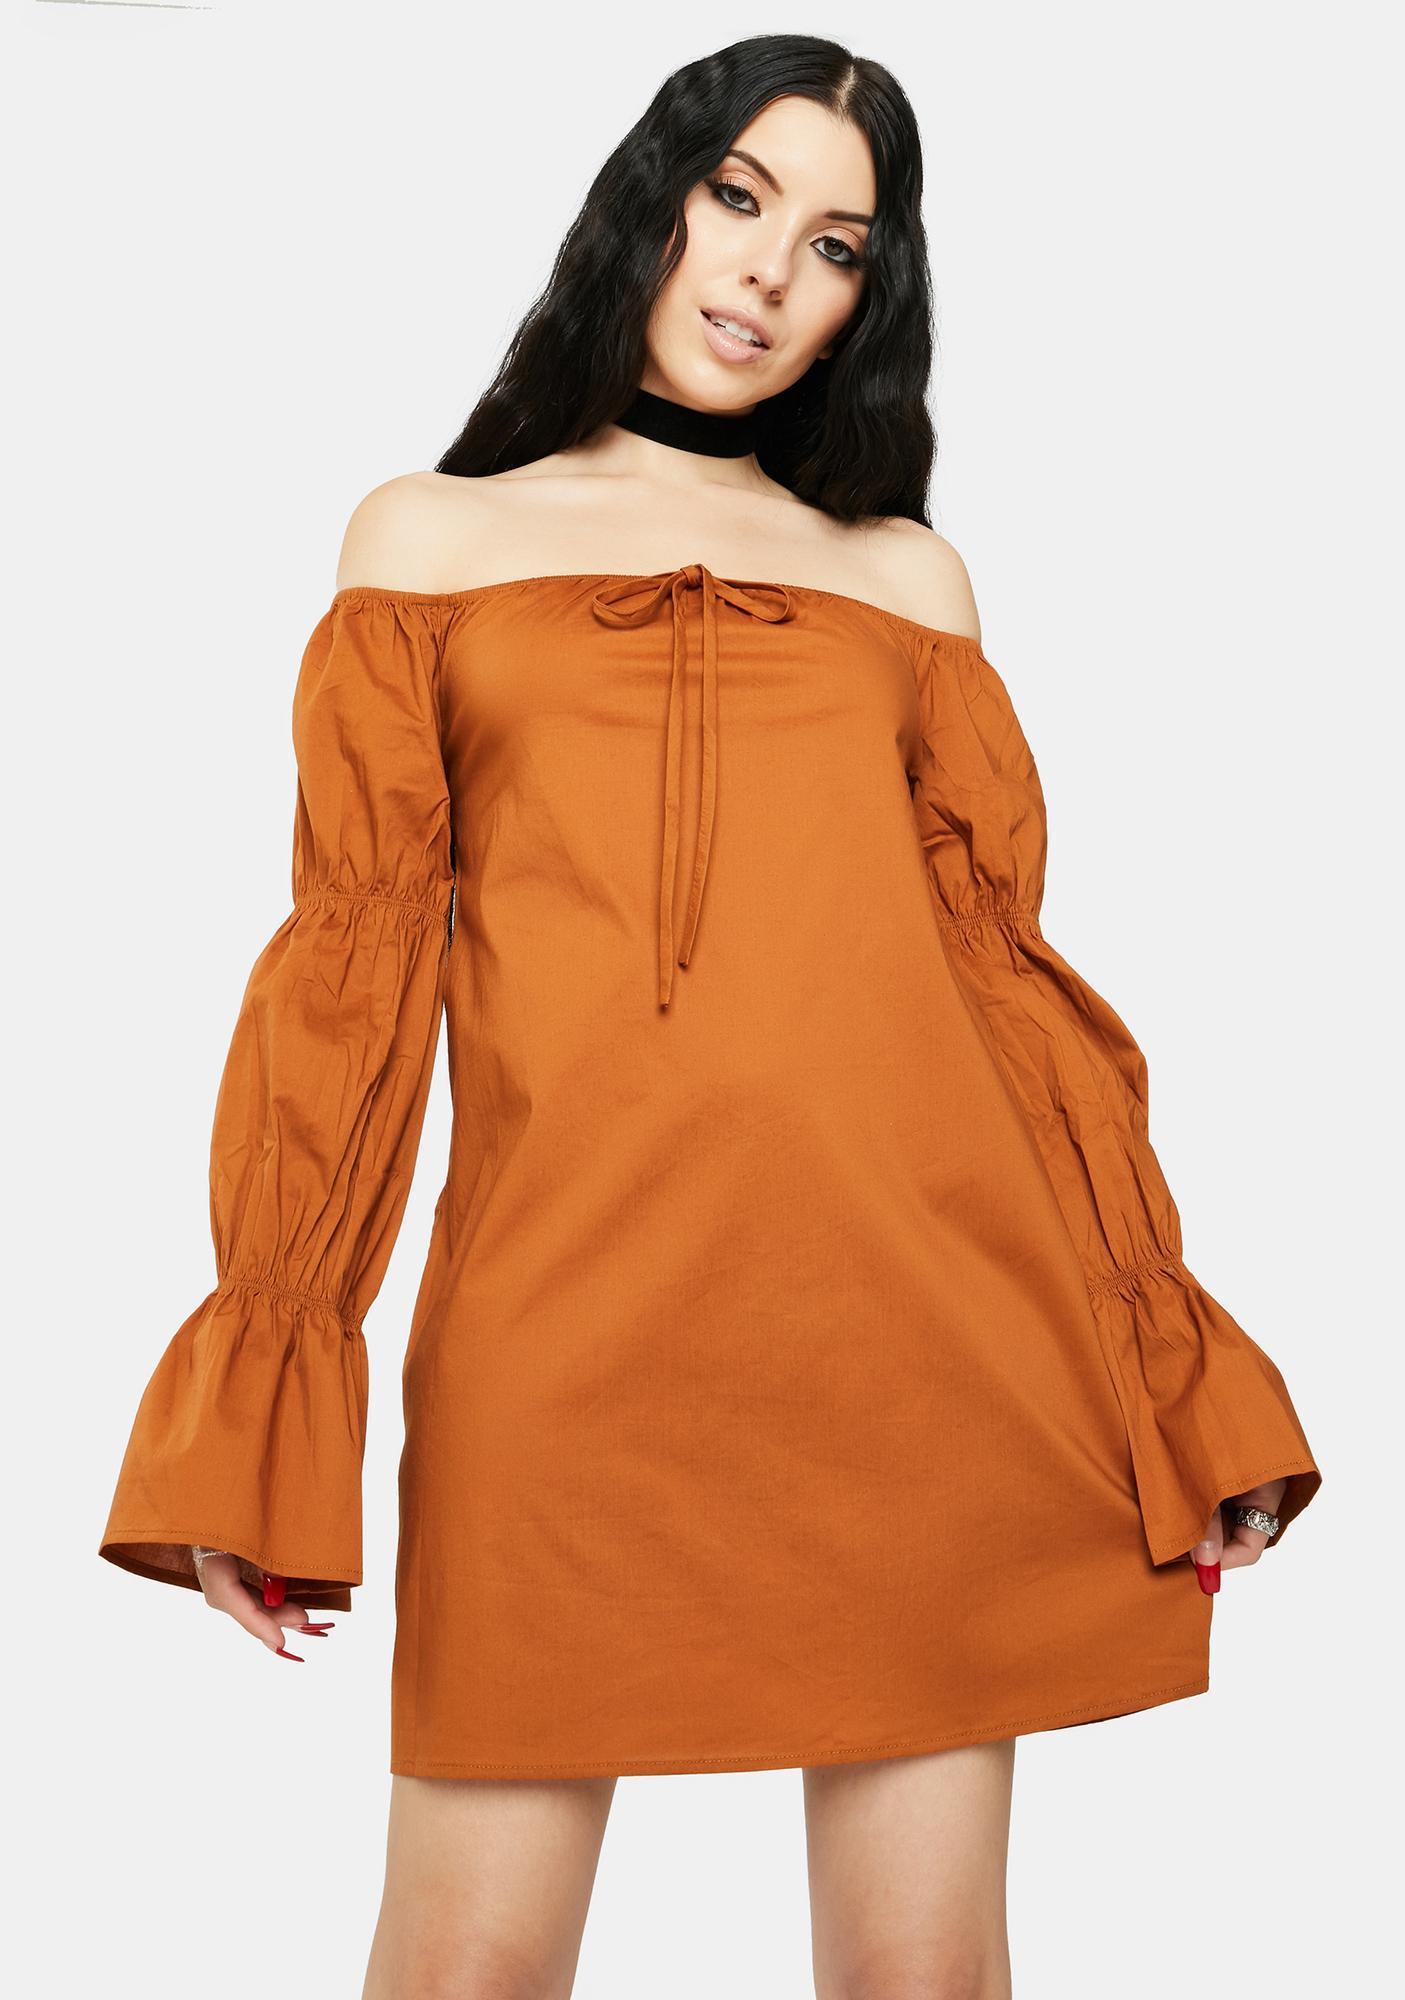 Bailey Rose Tan Off The Shoulder Dress